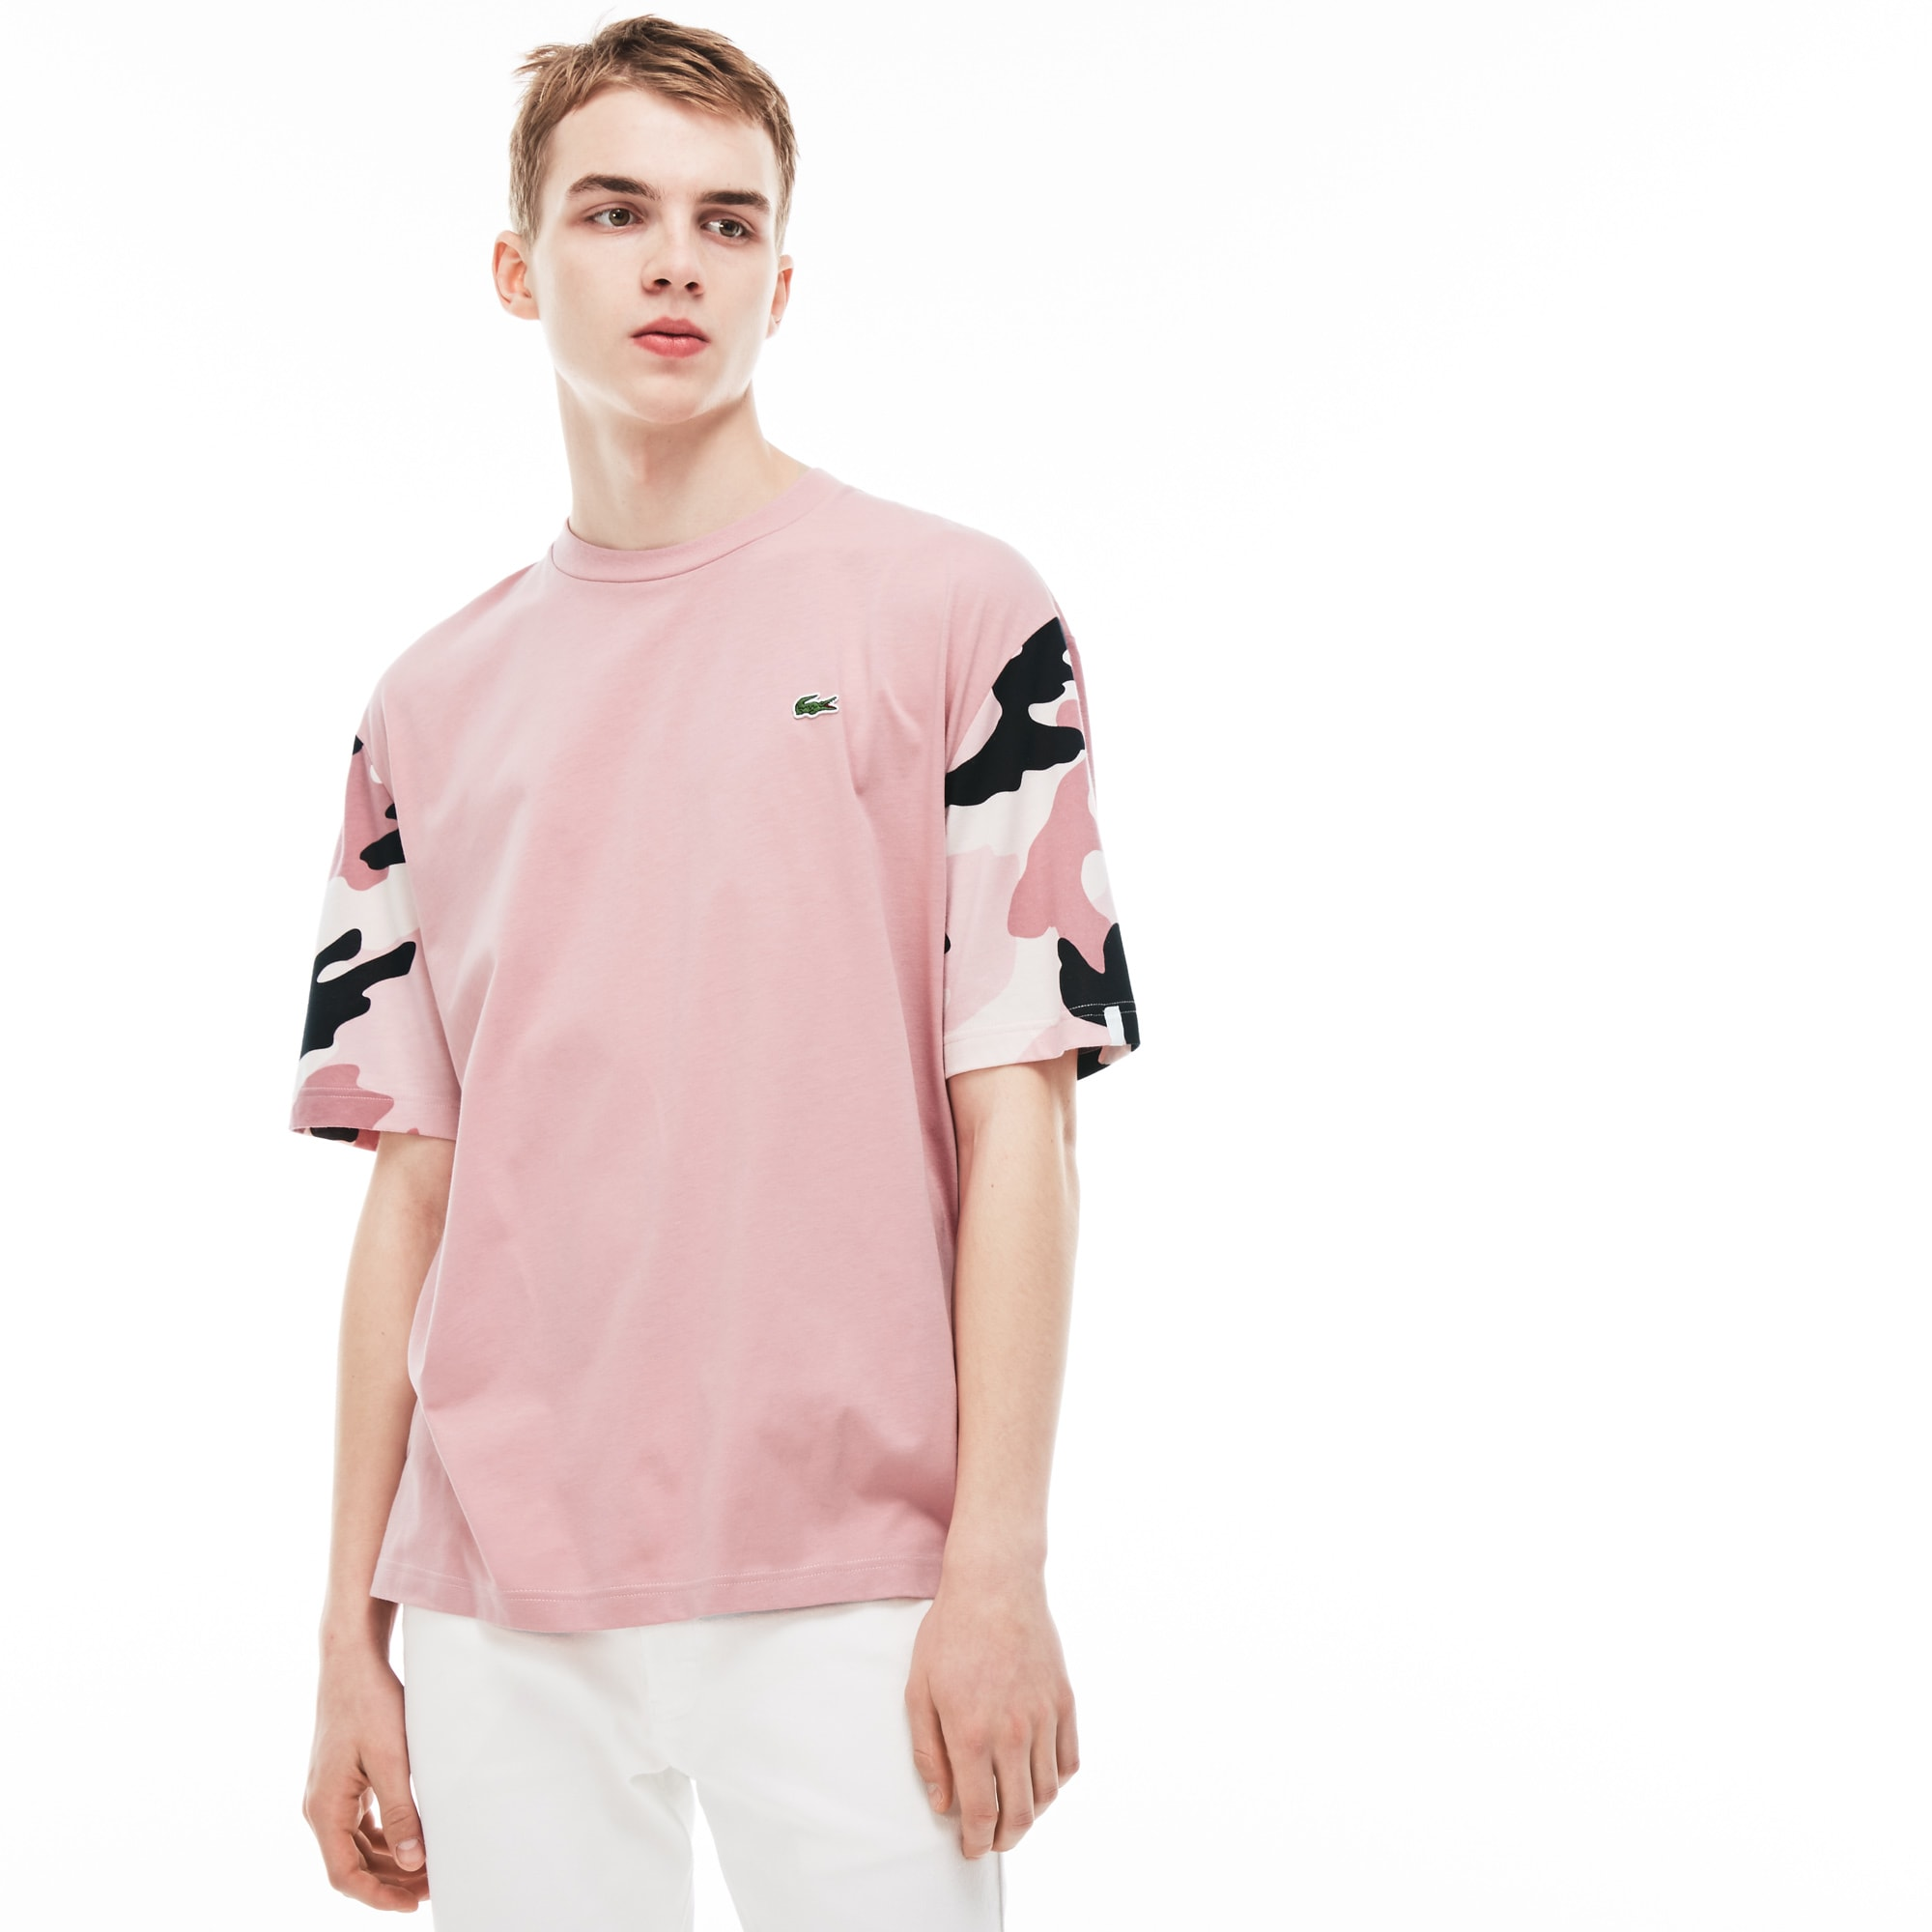 Men's Lacoste LIVE Crew Neck Print Sleeves Jersey T-shirt